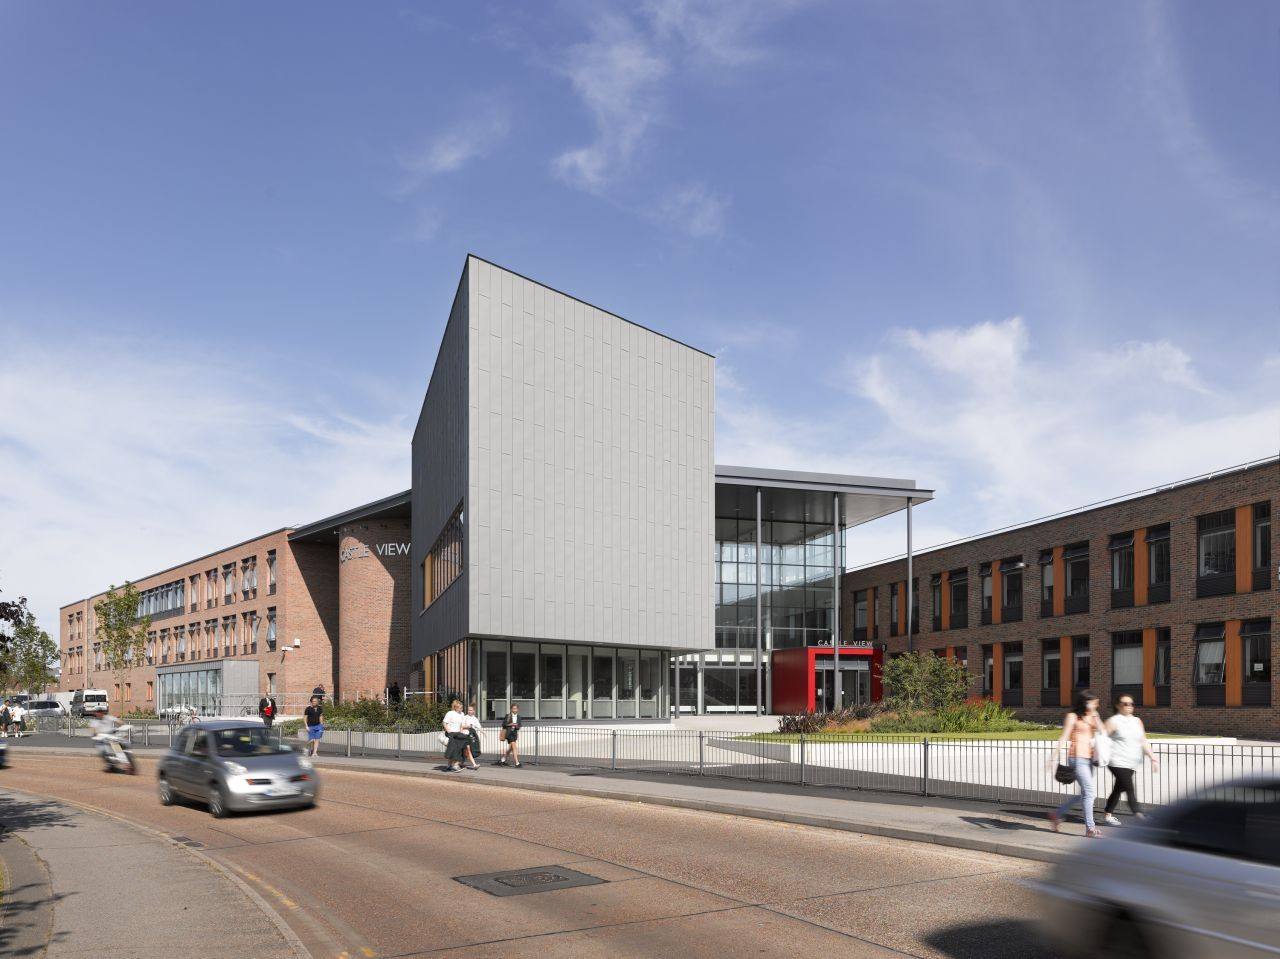 Castle View School / Nicholas Hare Architects, © Alan Williams